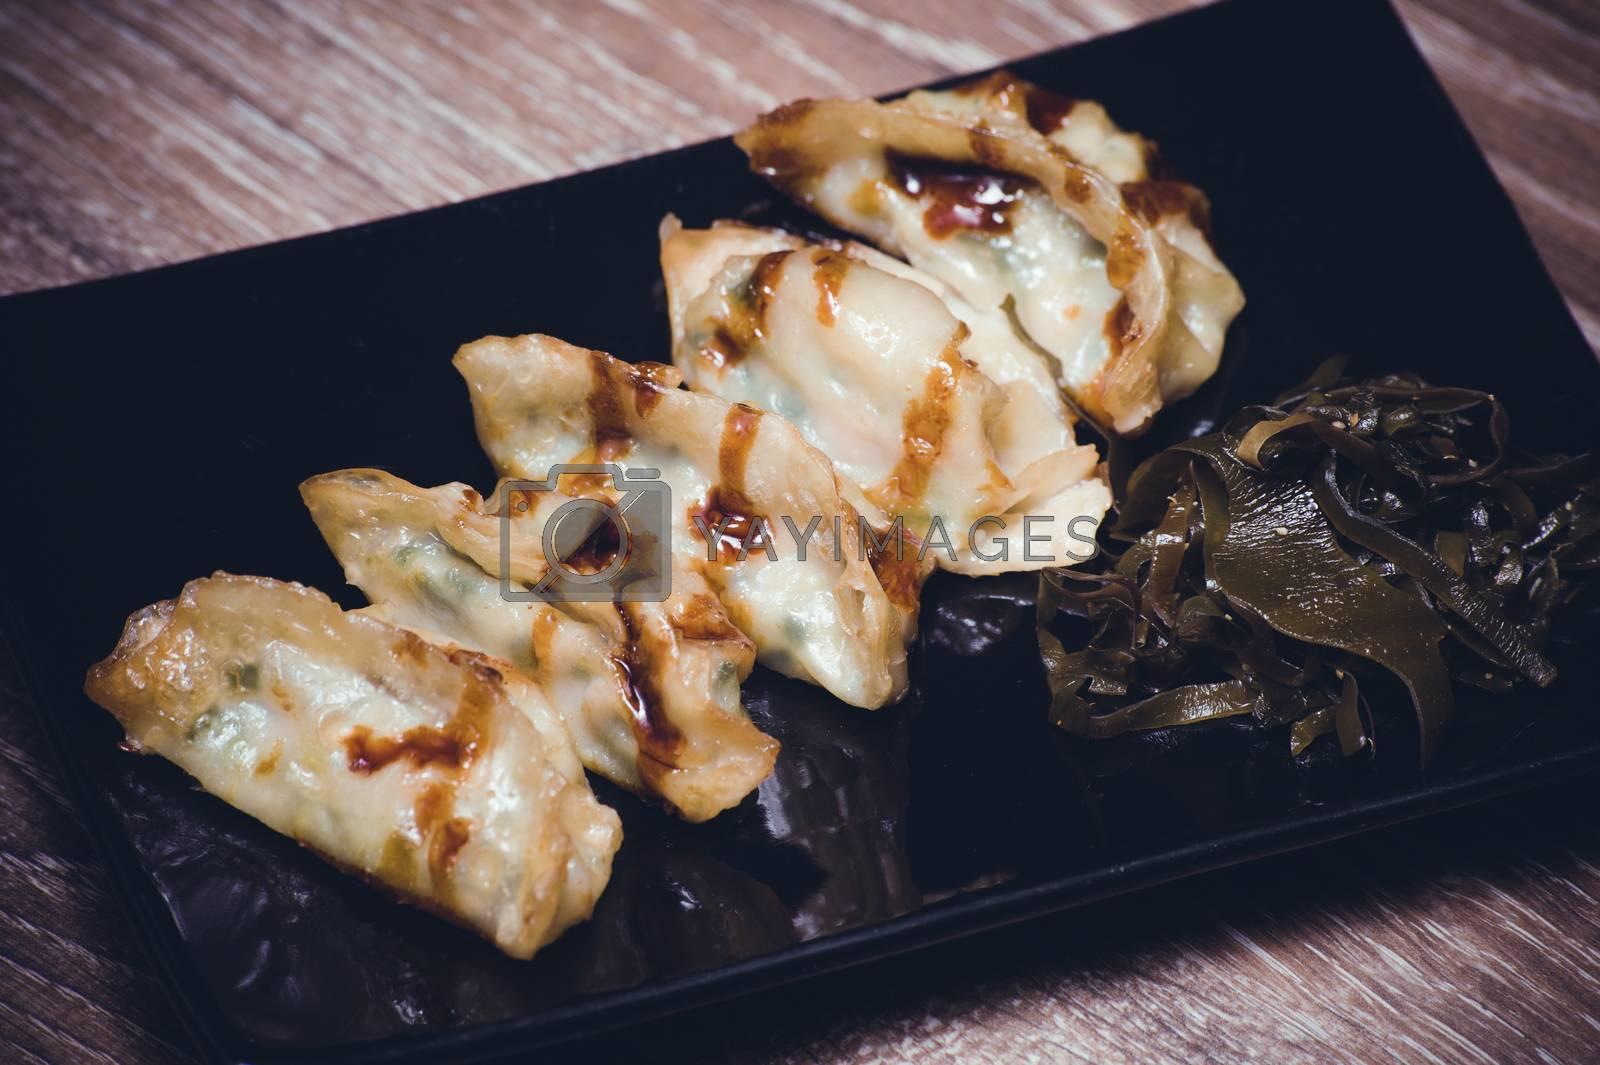 fried gyoza dumplings with sauce on black plate